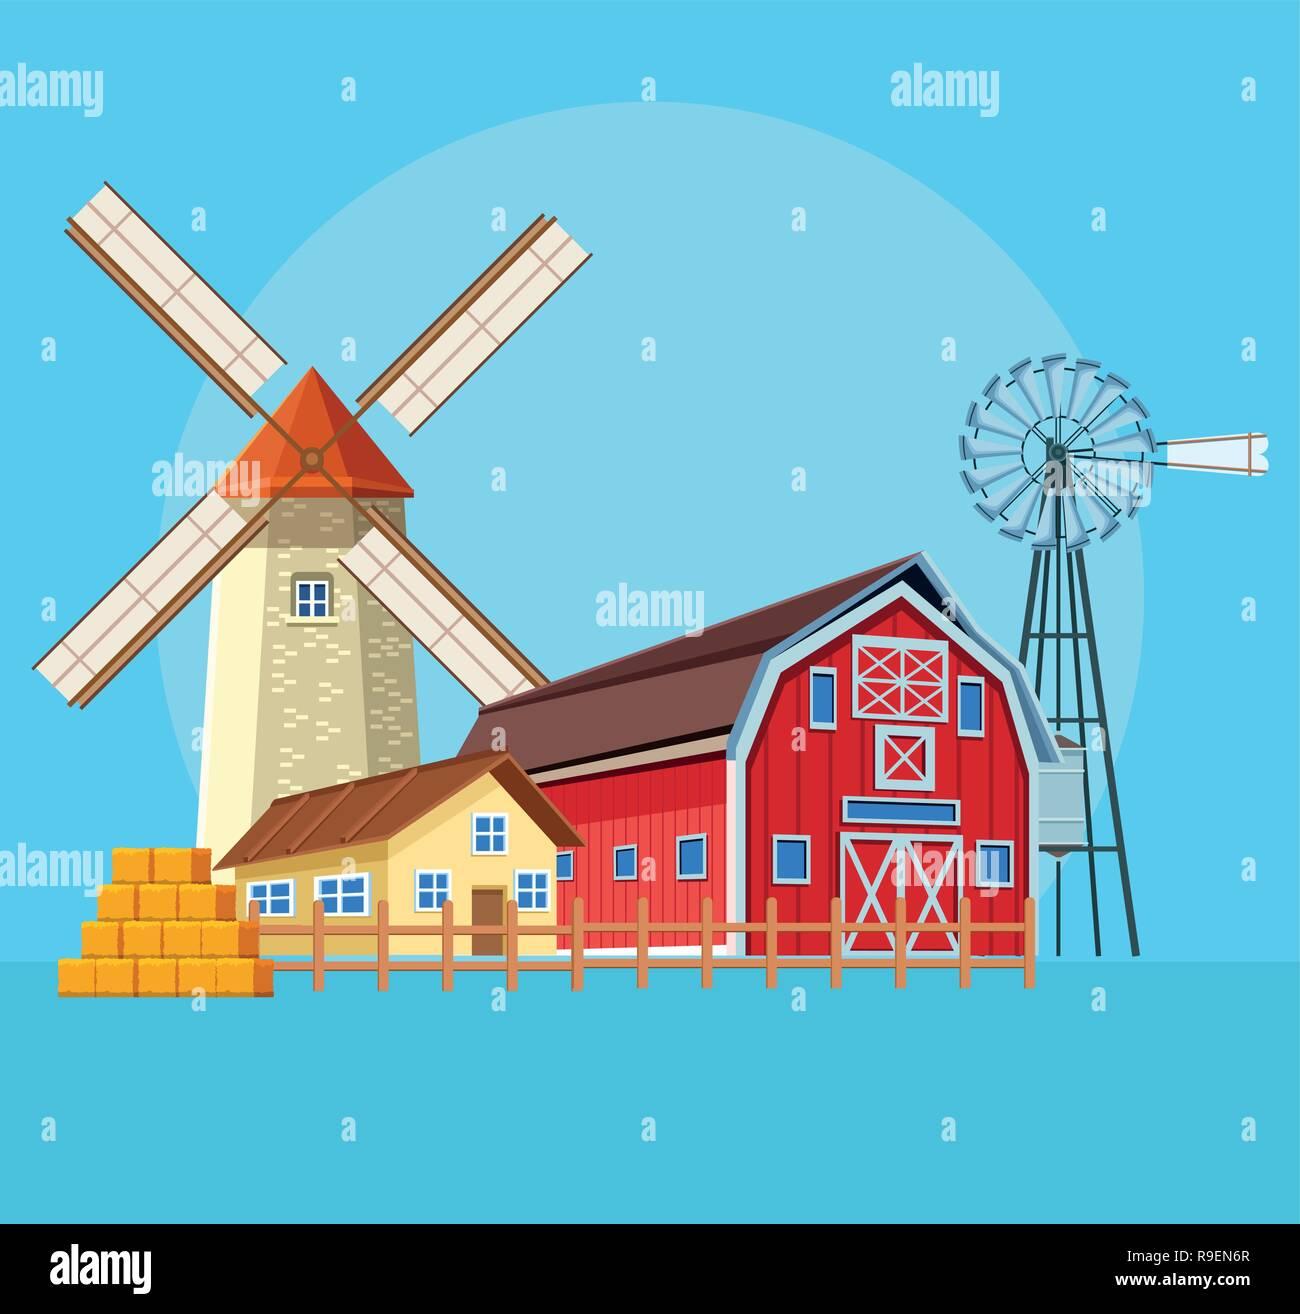 farm barn cartoon stock vector art illustration vector image